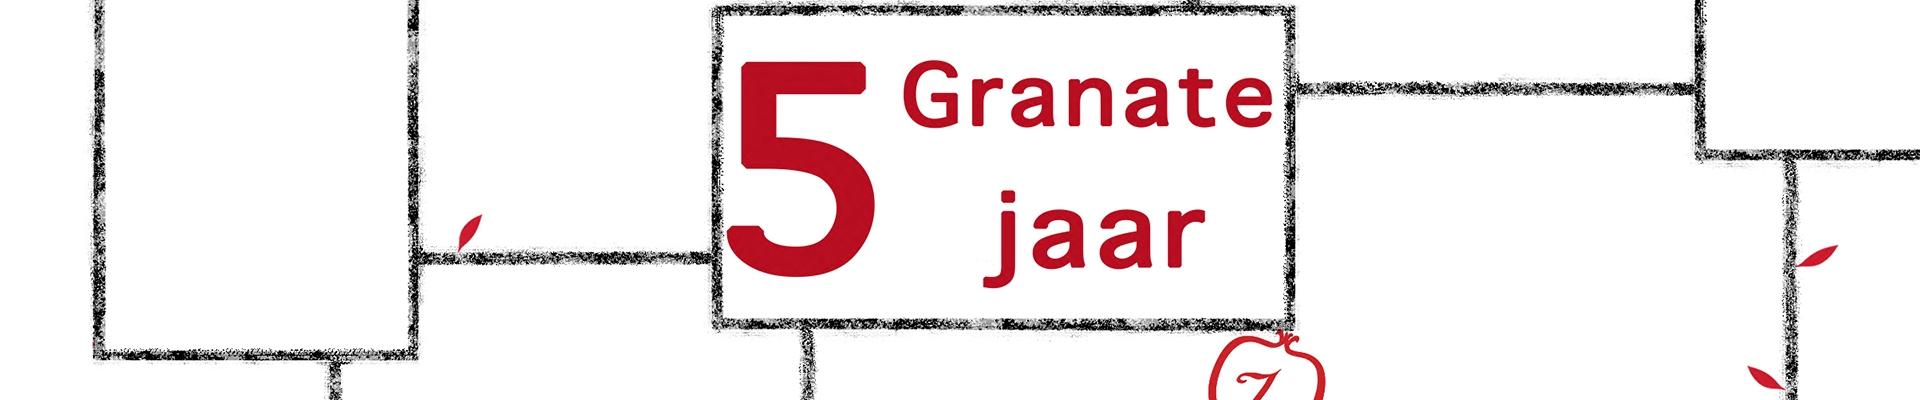 GRANATE 5 jaar